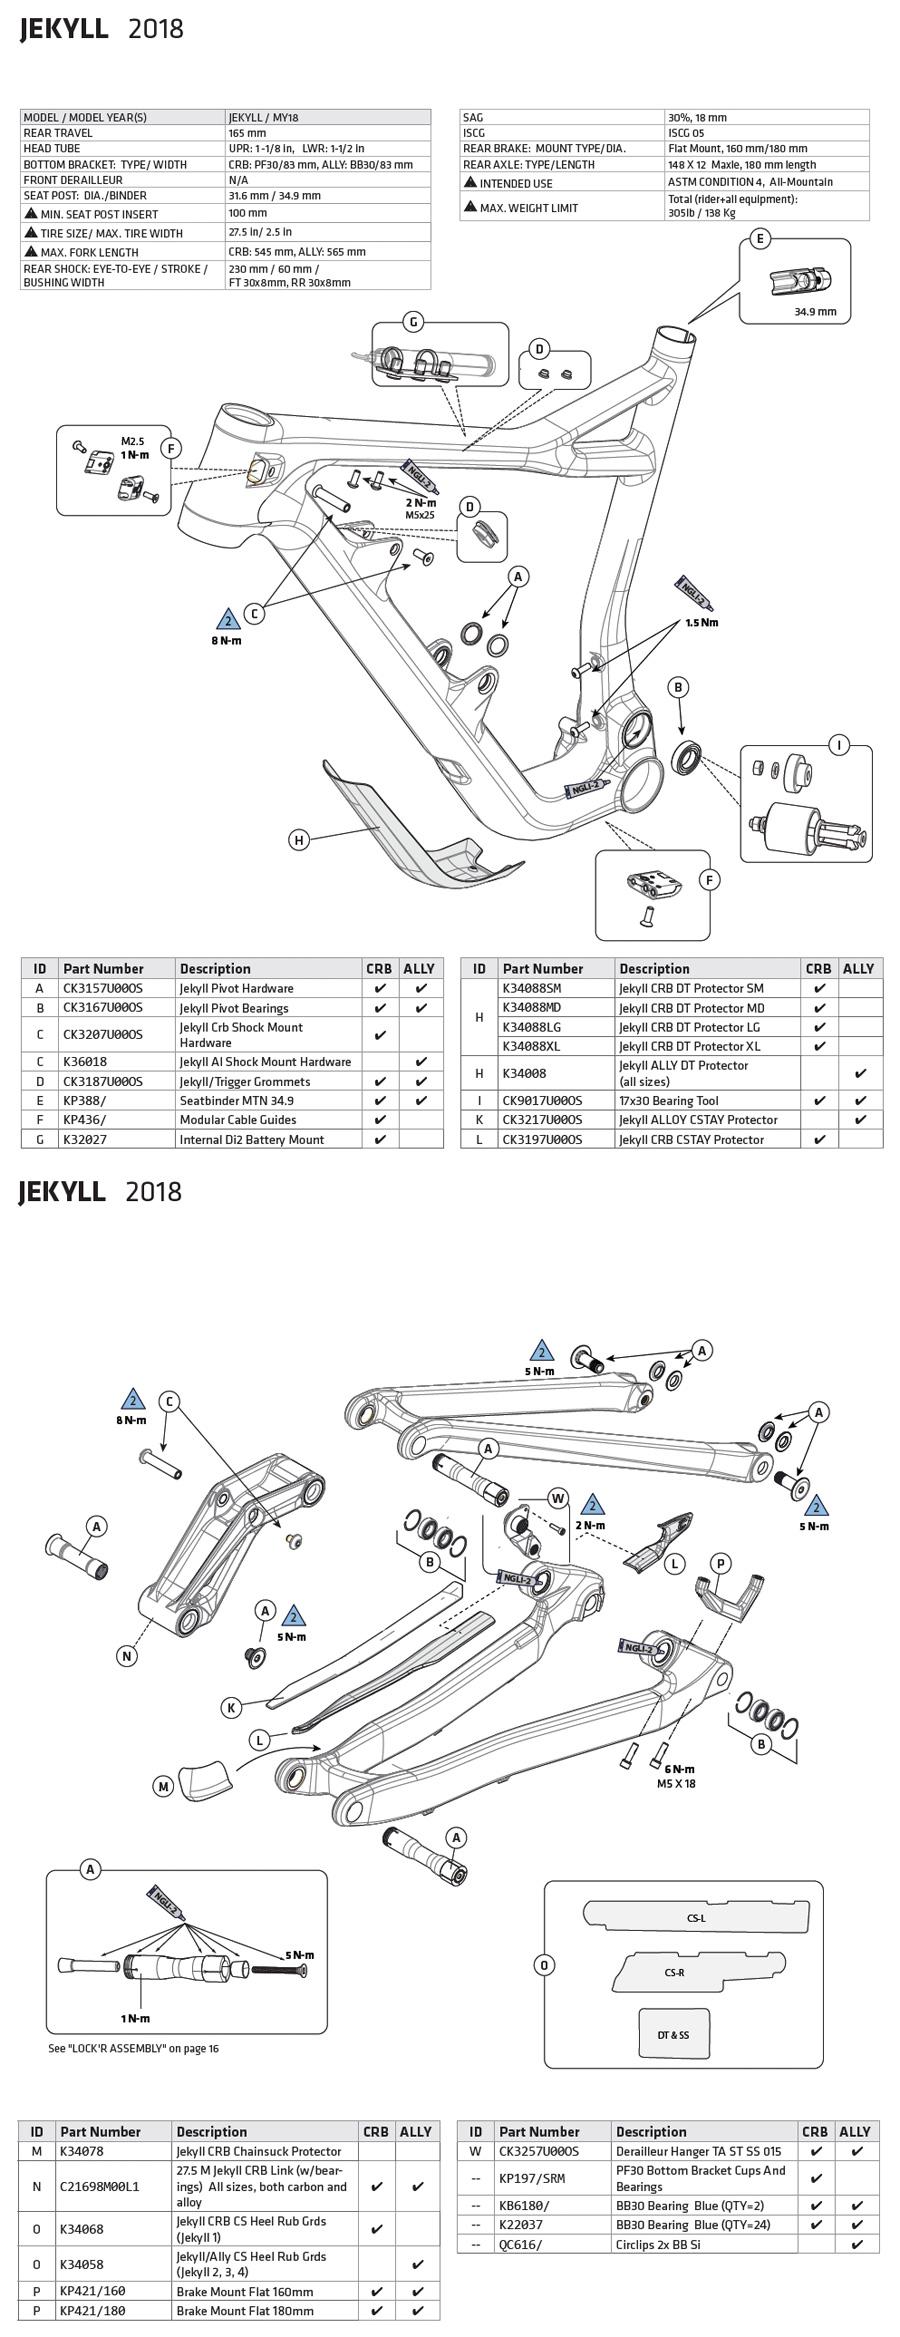 medium resolution of jekyll 2018 parts